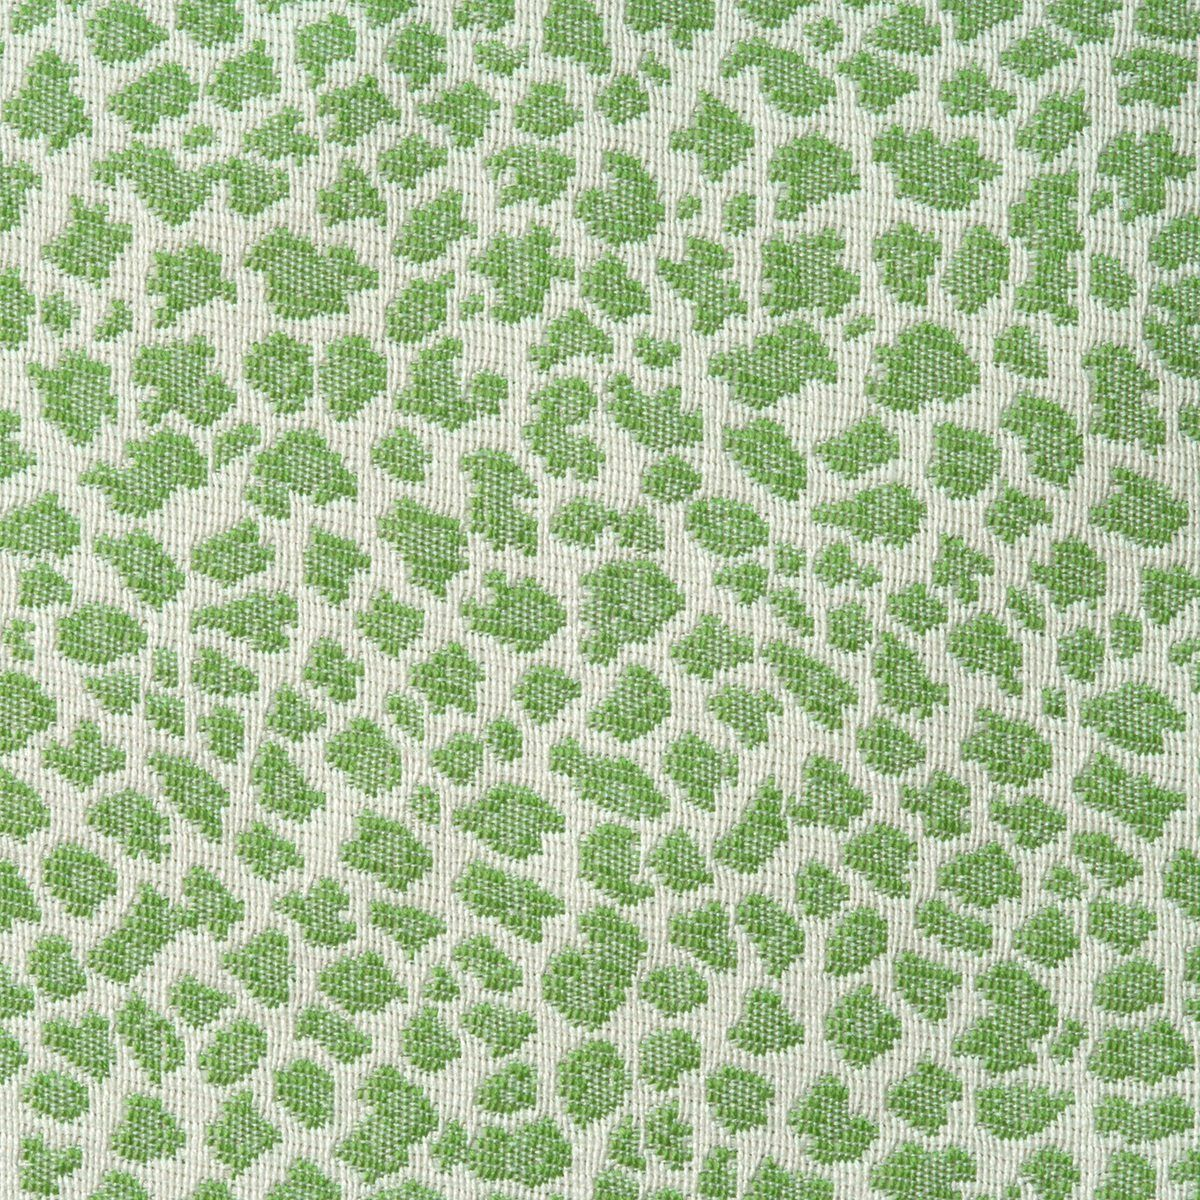 Al Fresco Mozam Crabapple Upholstery Fabric Animal Print